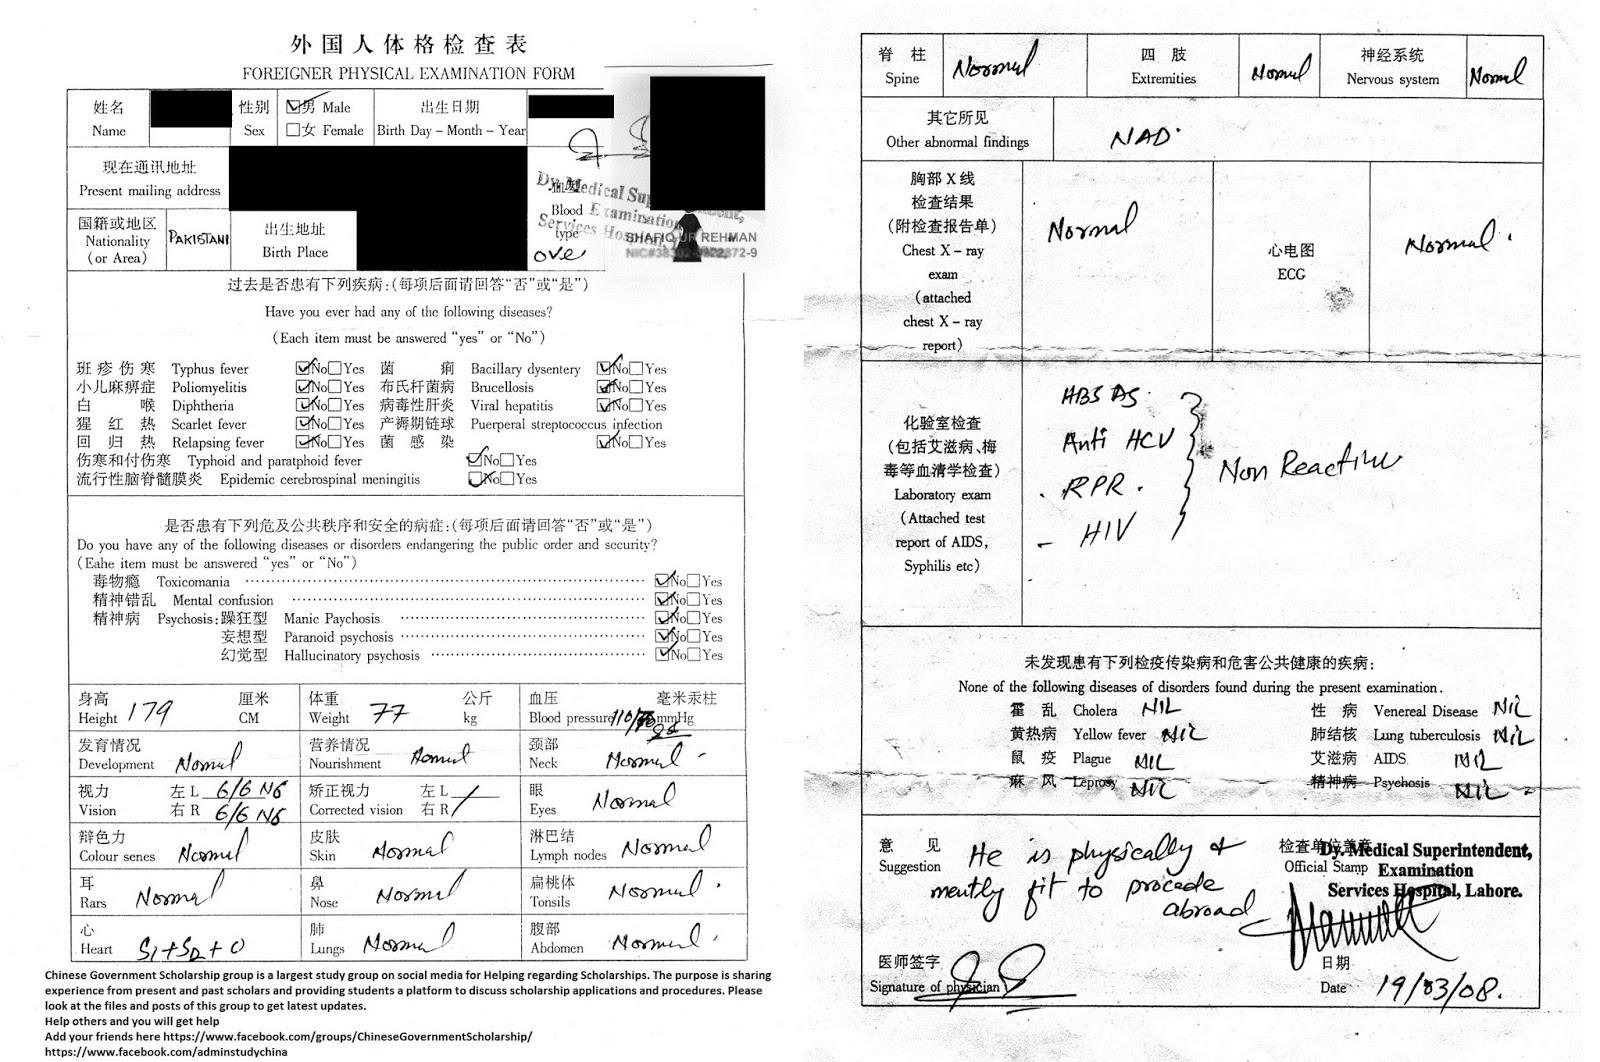 Foreigner Physical Examination Form China Pdf